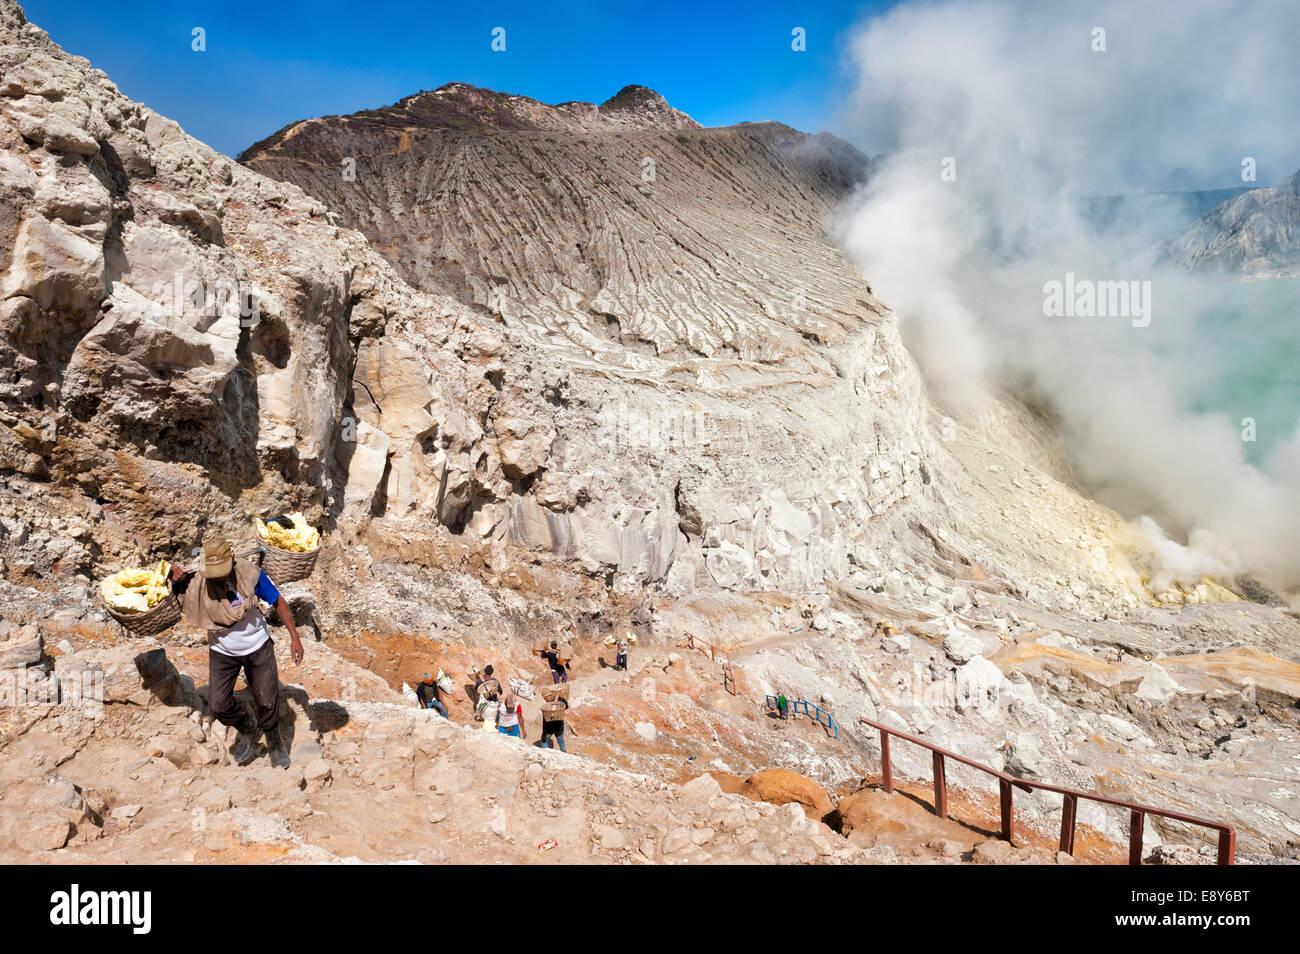 Sulphur carriers climbing out of Kawah Ijen volcano (Ijen crater), Banyuwangi, East Java, Indonesia, Asia - Stock Image